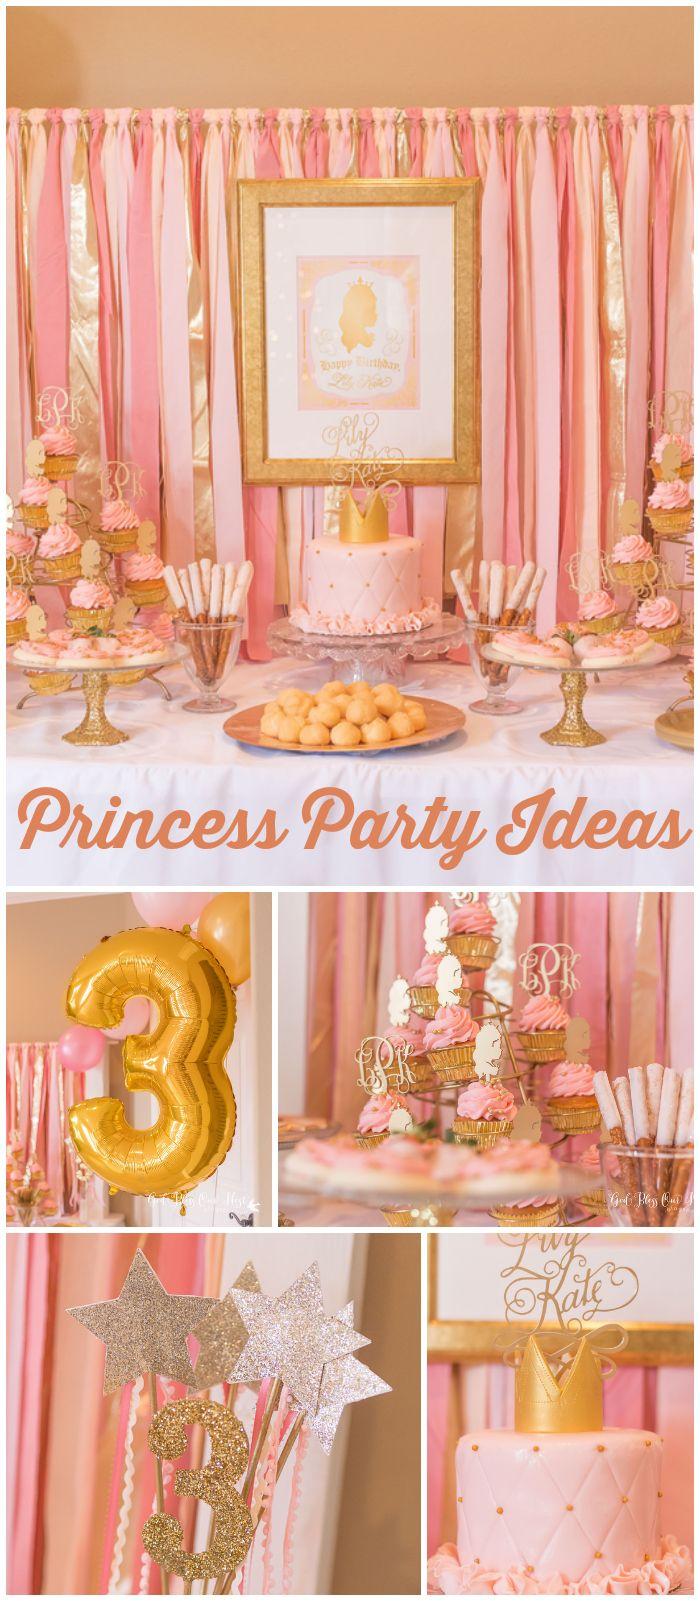 Birthday backdrop on pinterest birthday decorations for Background decoration for birthday party